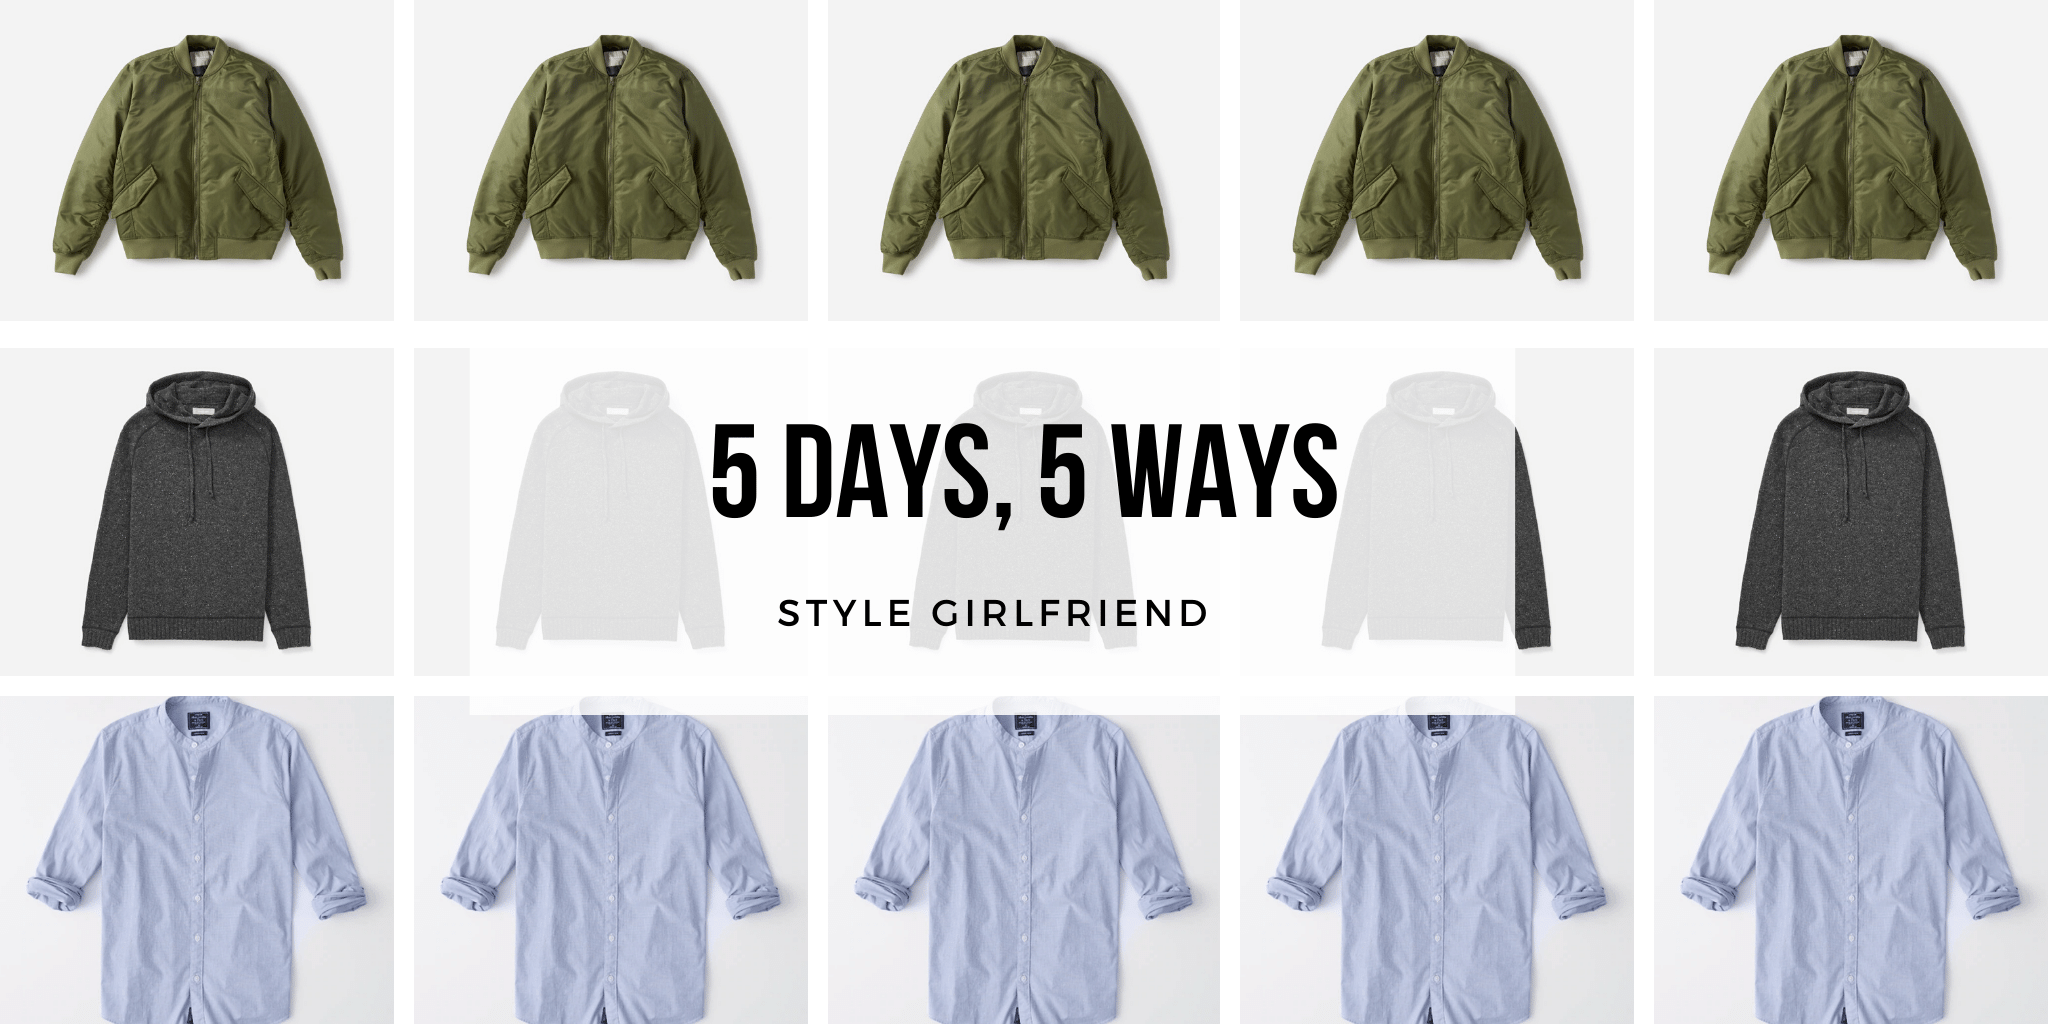 style girlfriend 5 days 5 ways